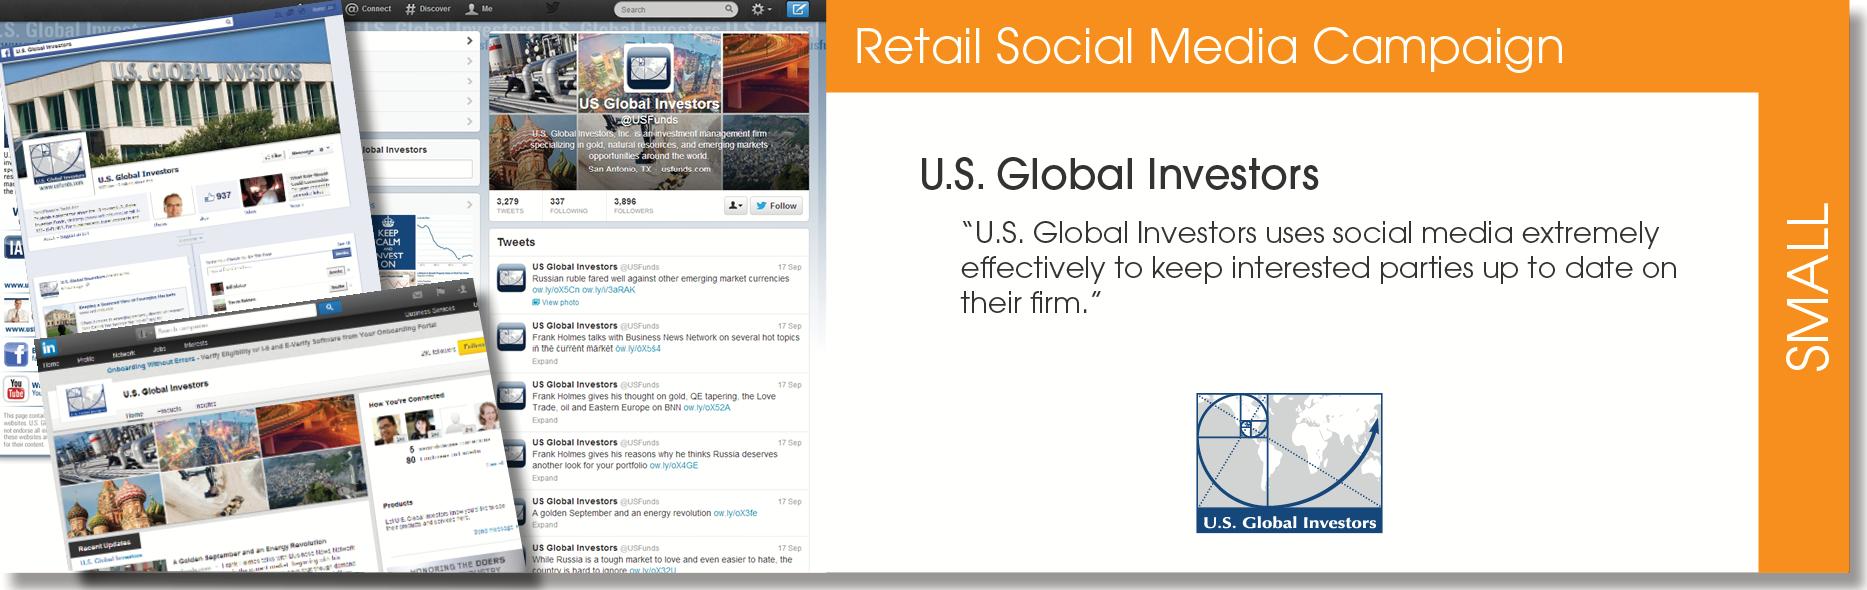 Small Retail Winner Image10